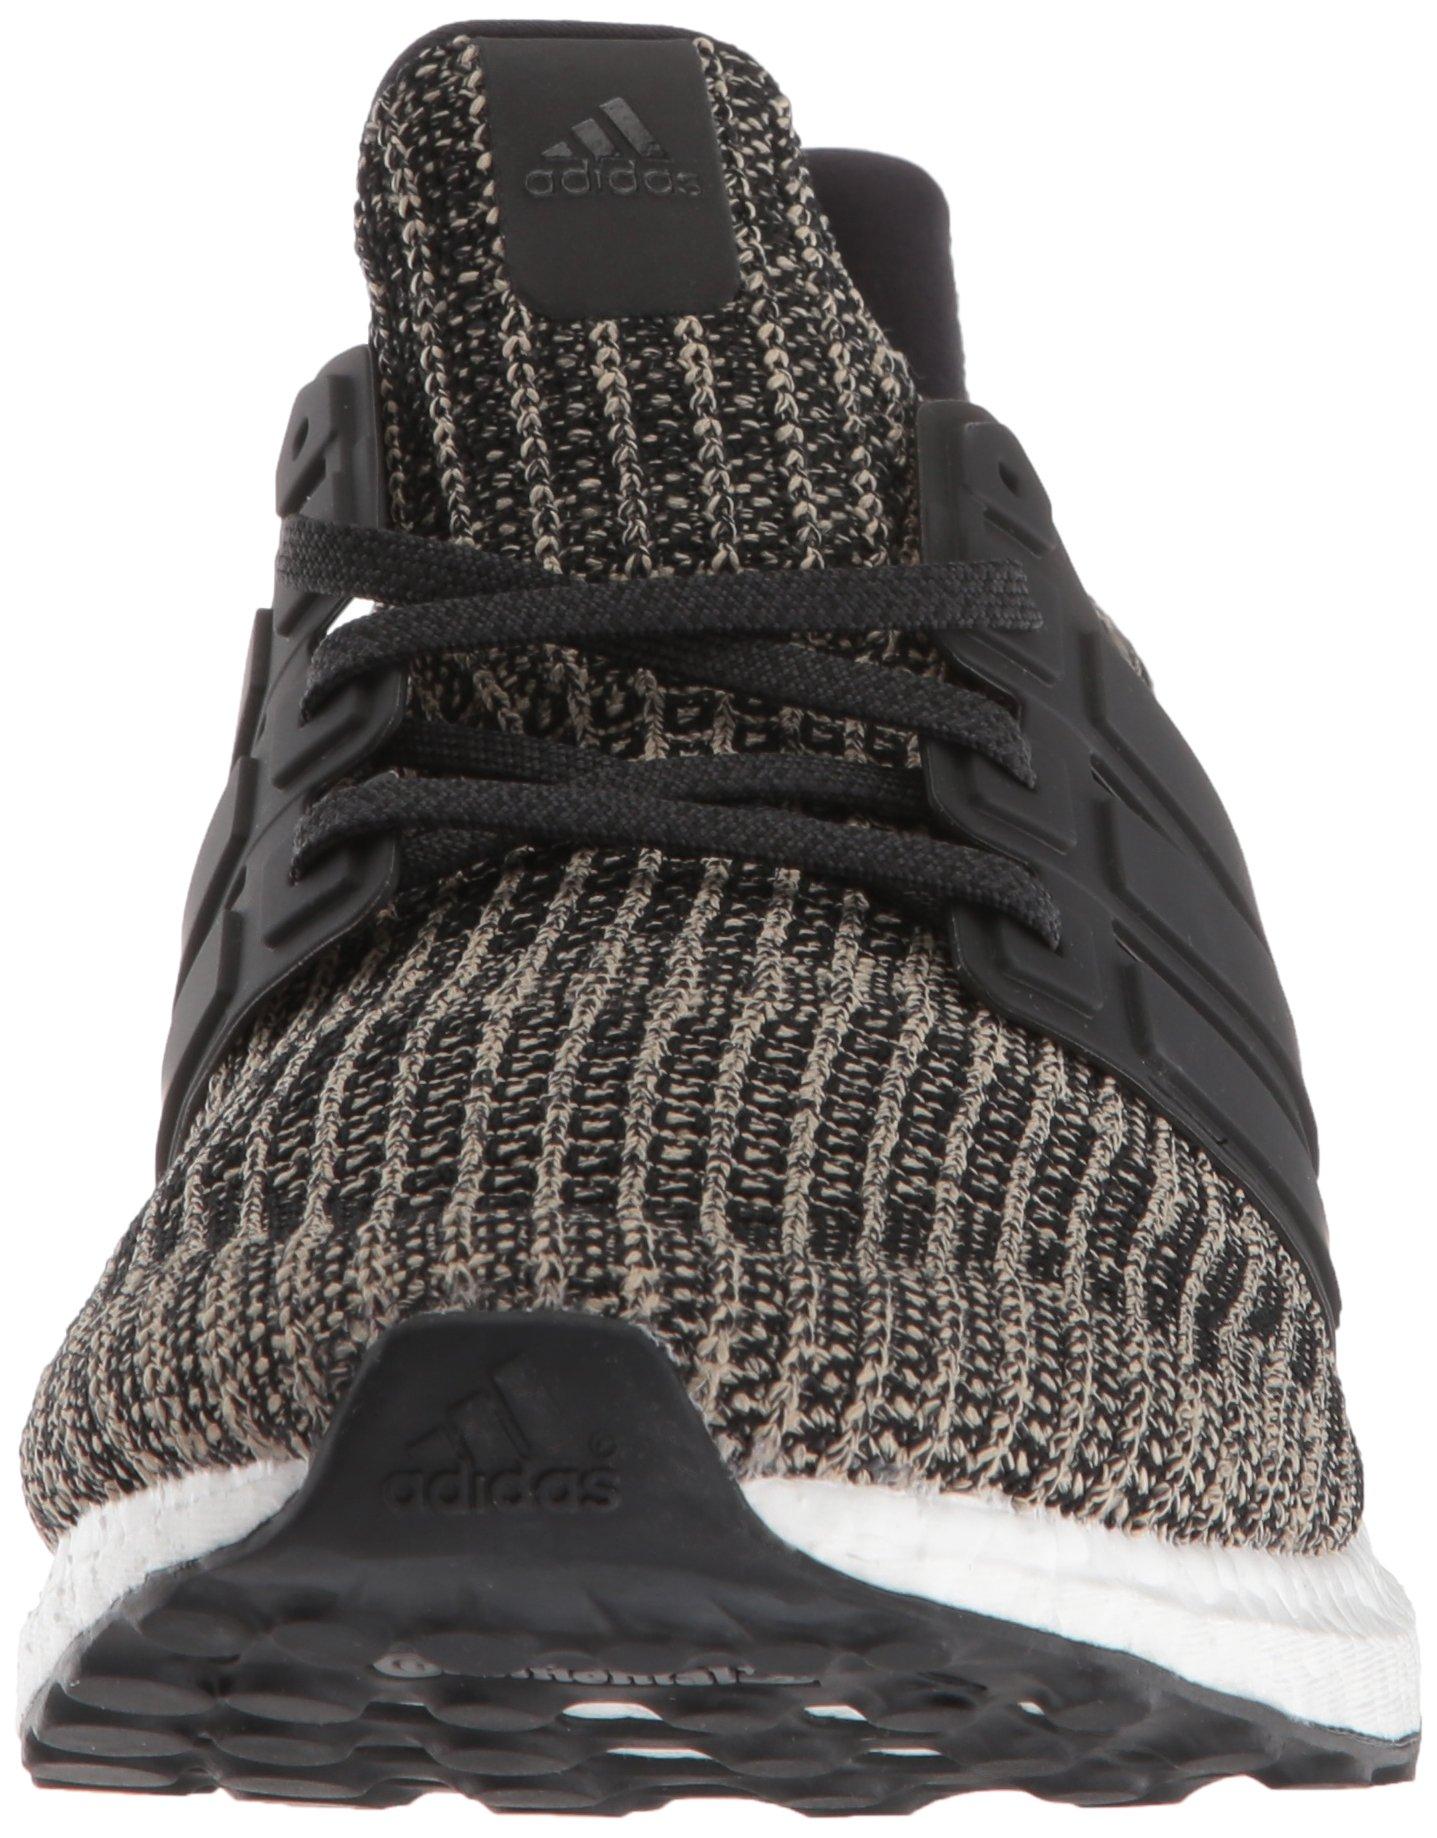 adidas Men's Ultraboost, Black/raw Gold, 6.5 M US by adidas (Image #4)